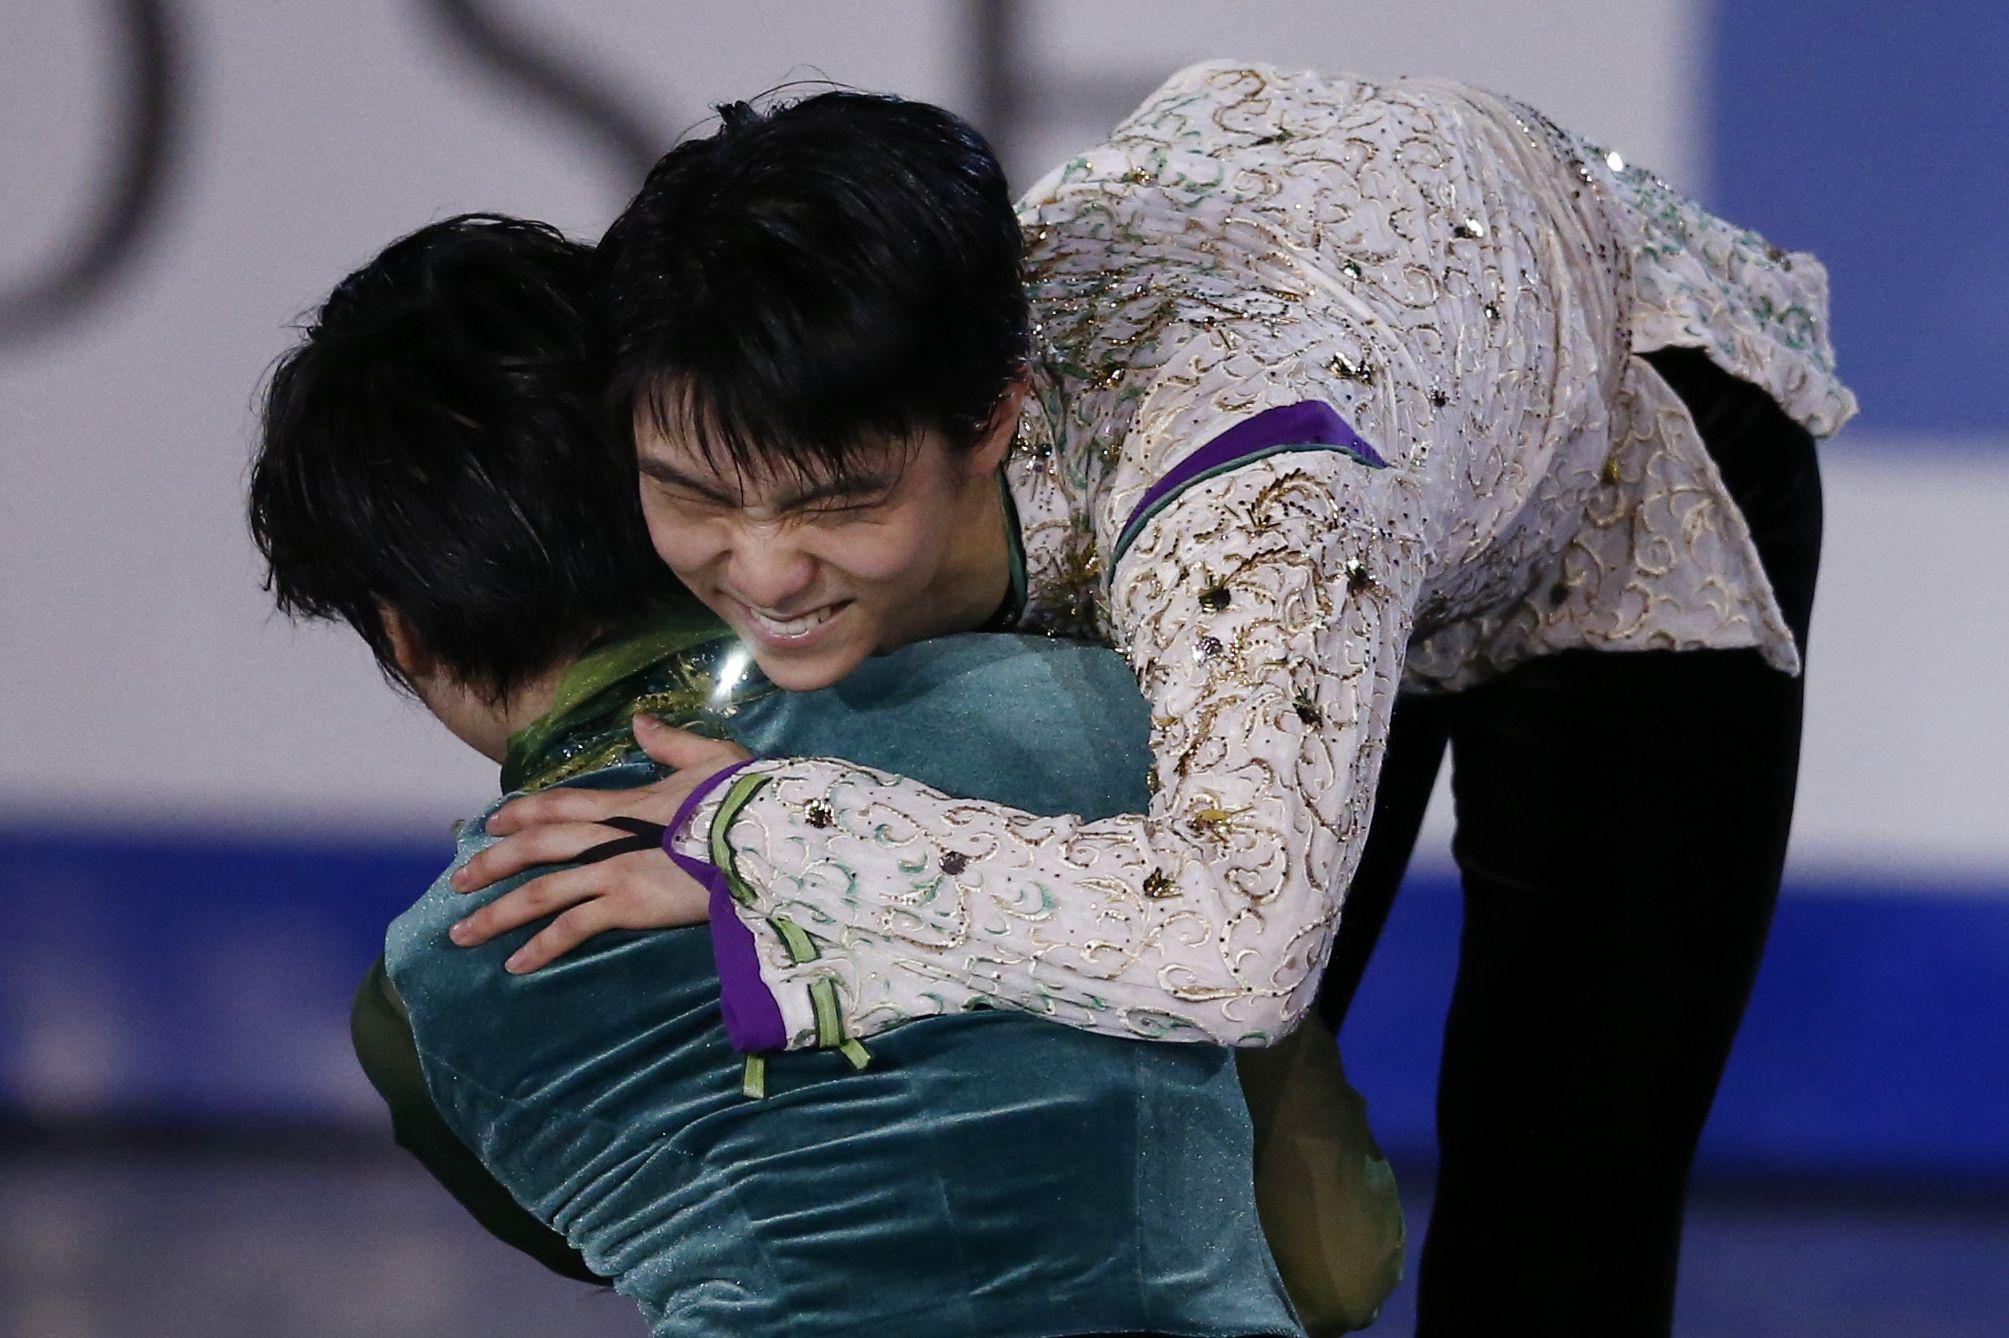 Gold medal winner Yuzuru Hanyu of Japan, right hugs Shoma Uno of Japan who won the bronze in the Men's final of the Grand Prix Final figure skating competition in Barcelona, Spain, Saturday, Dec. 12, 2015. (AP Photo/Manu Fernandez)